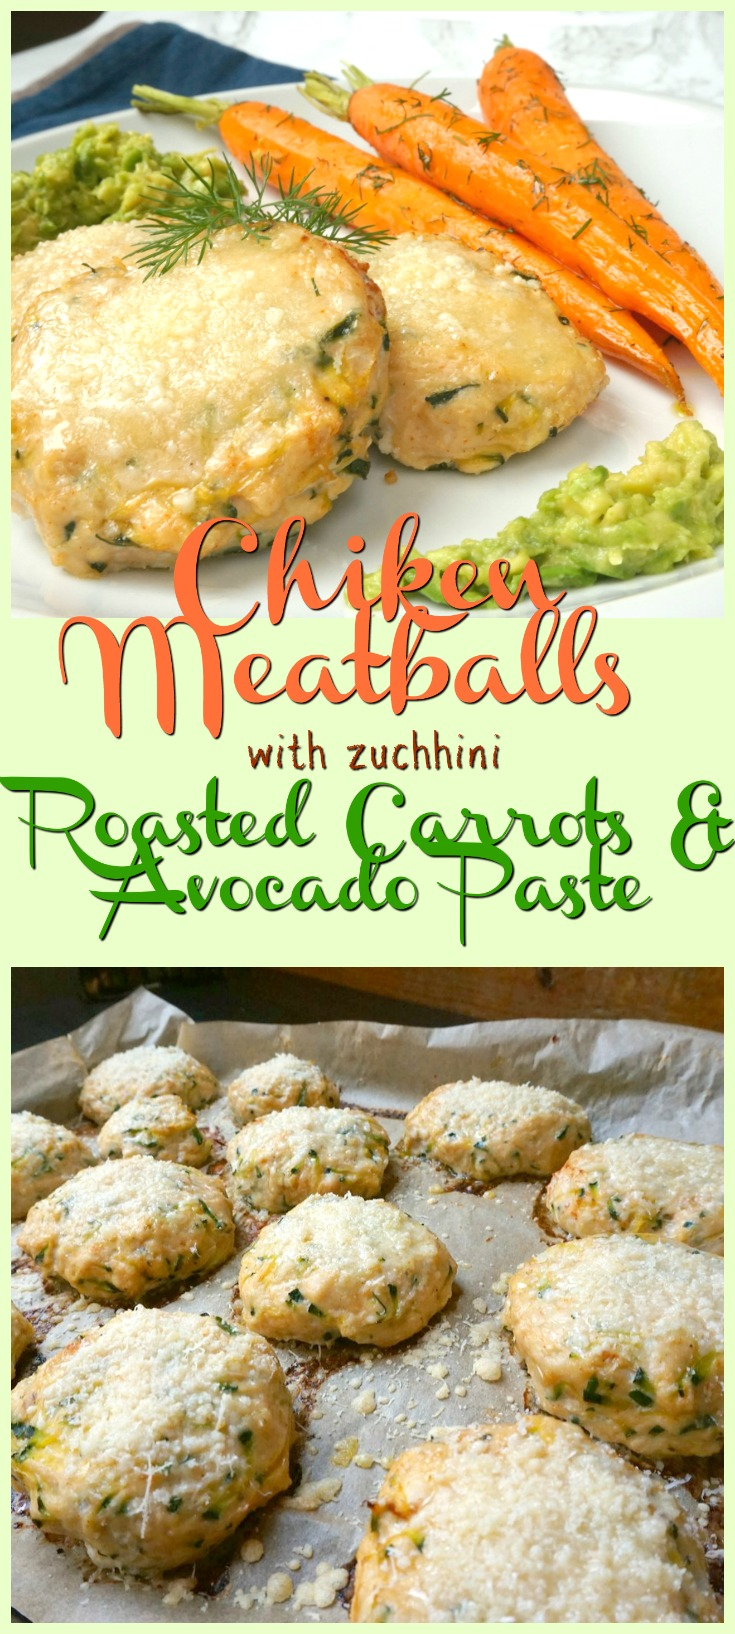 chicken - meatballs - carrots - zuchhini - avocado - gym - fitness - healthy - food